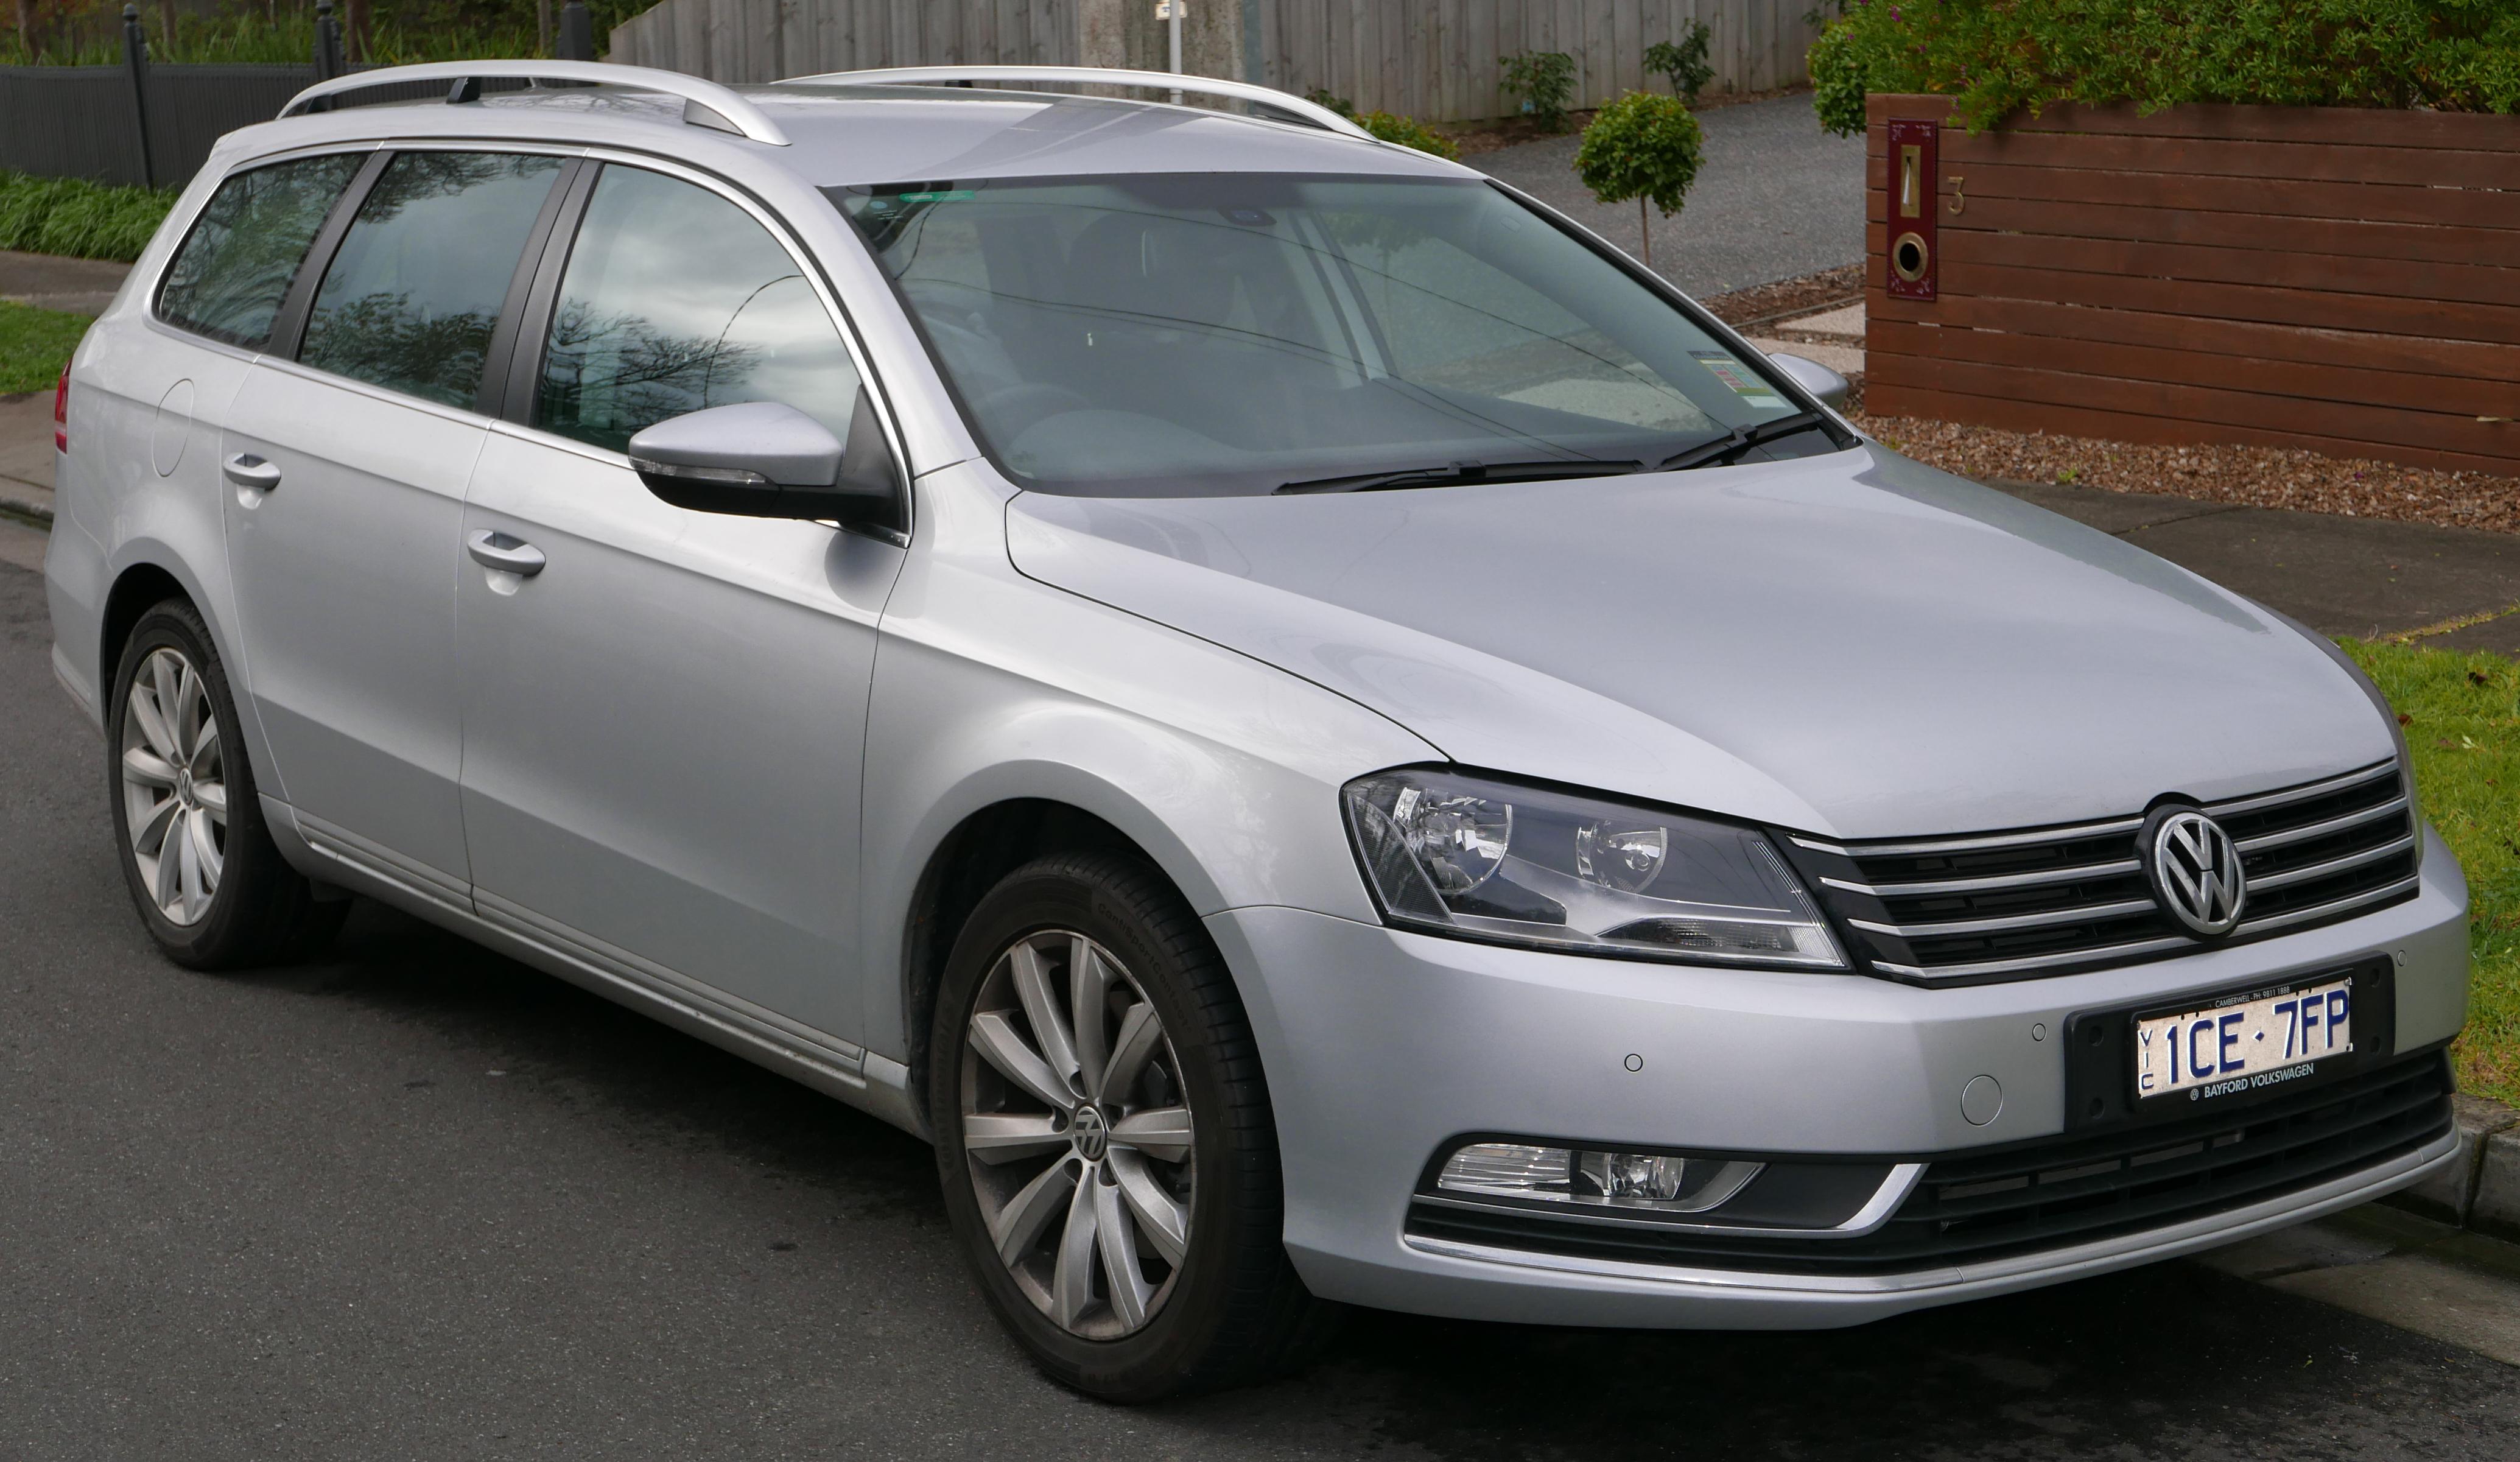 File:2014 Volkswagen Passat (3C MY15) 118TSI station wagon (2015-08 ...